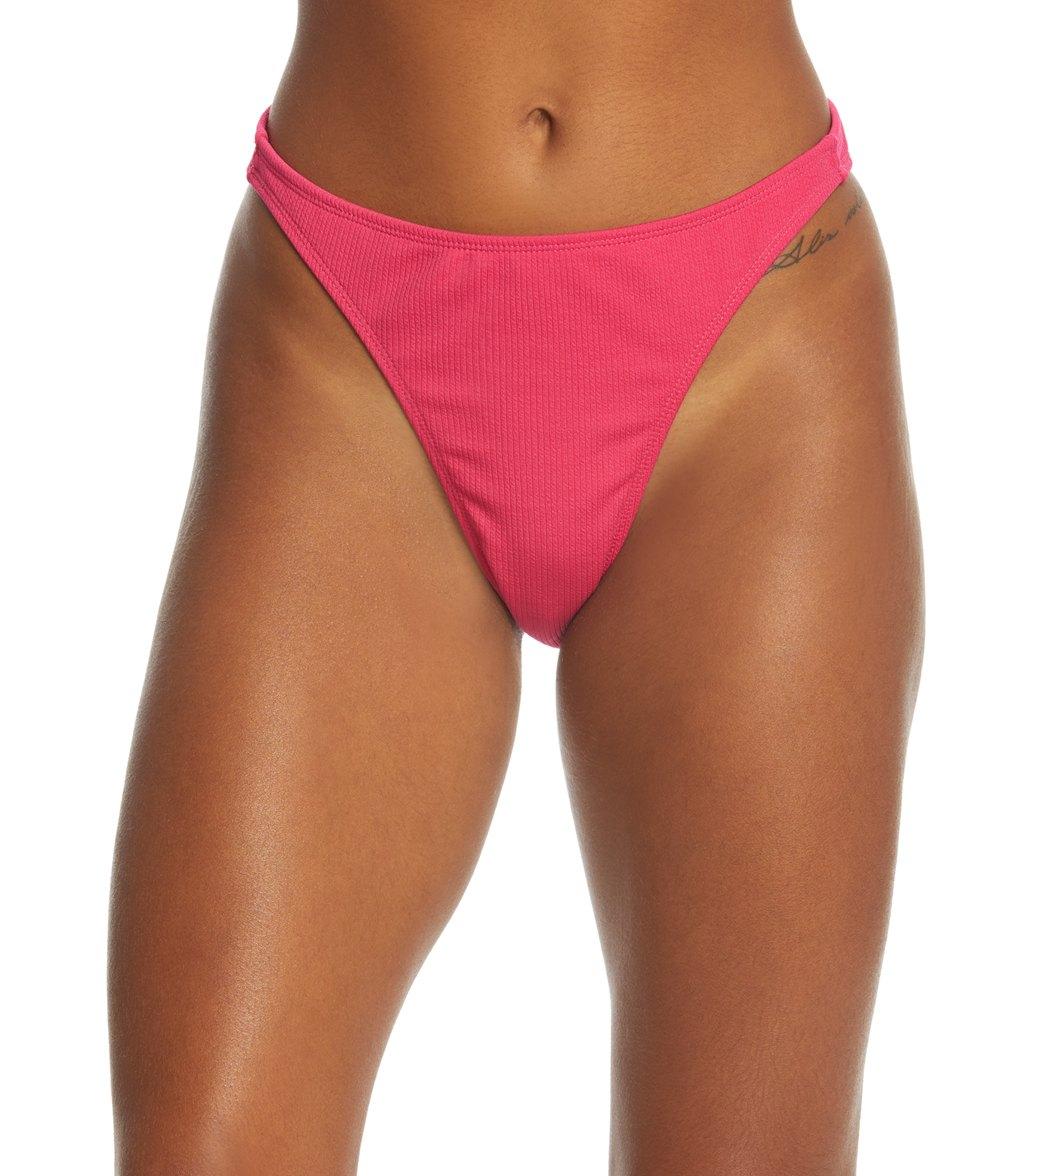 aa221bffb55d7 Motel Valoria Ribbed High Waist Bikini Bottom at SwimOutlet.com